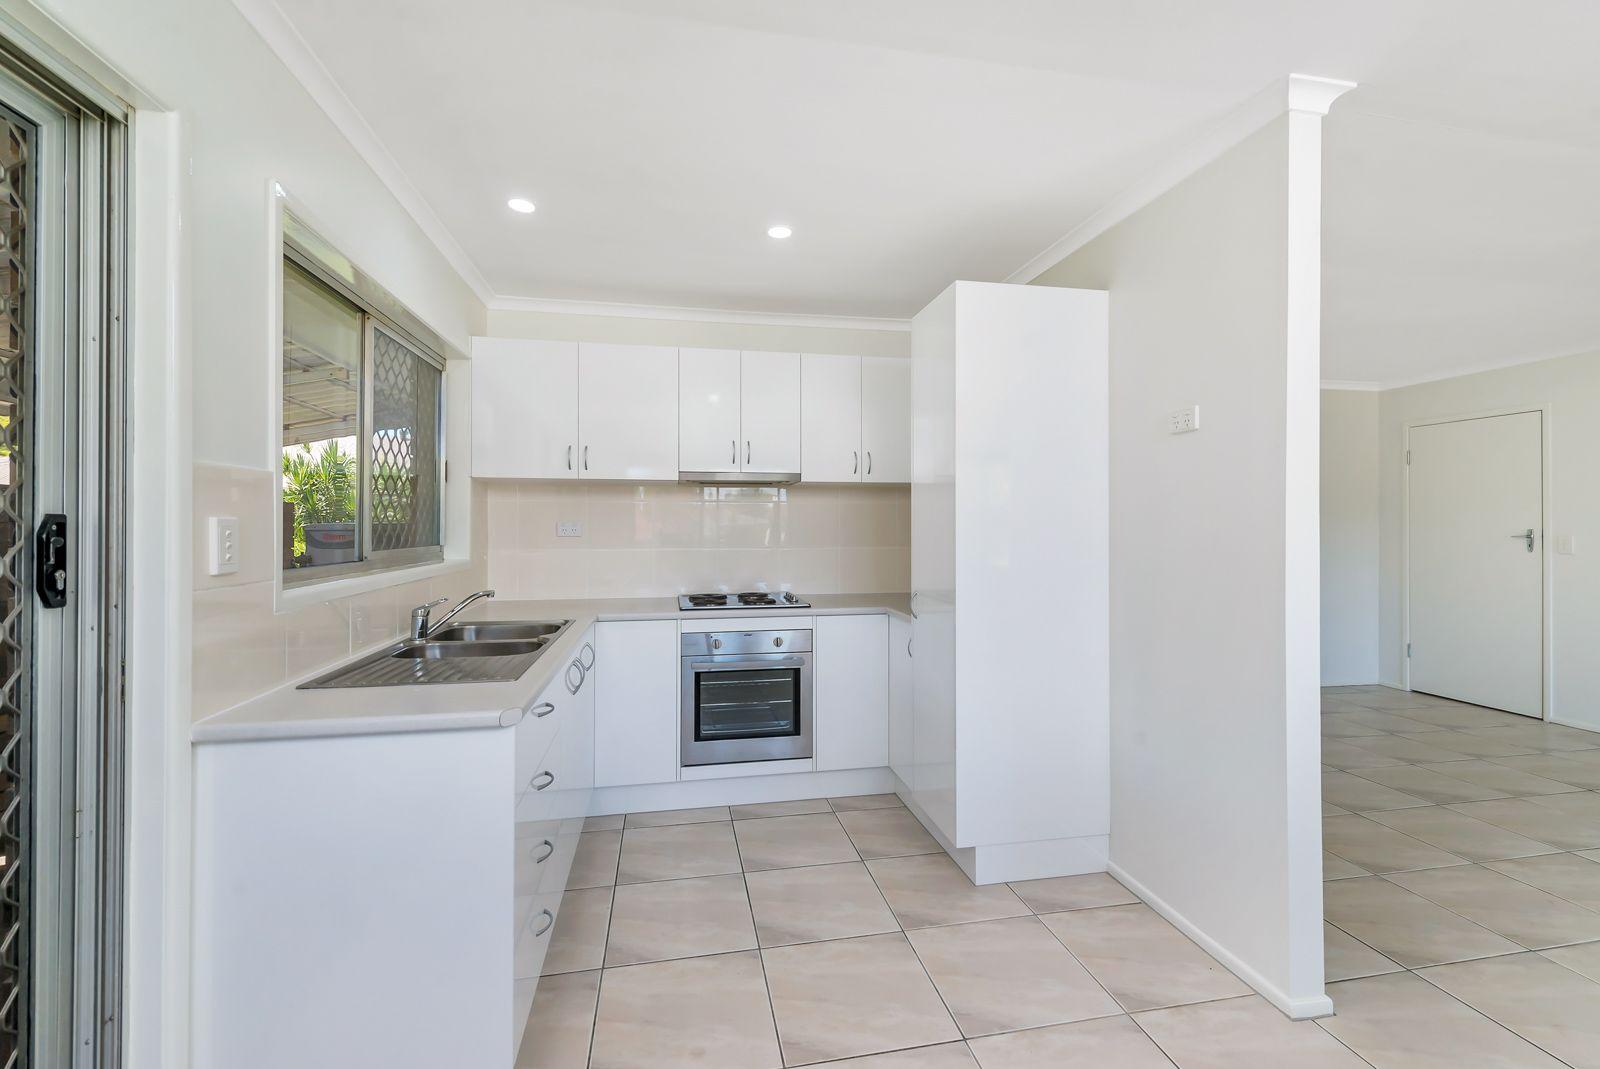 5 Raki Street, Mcdowall QLD 4053, Image 2